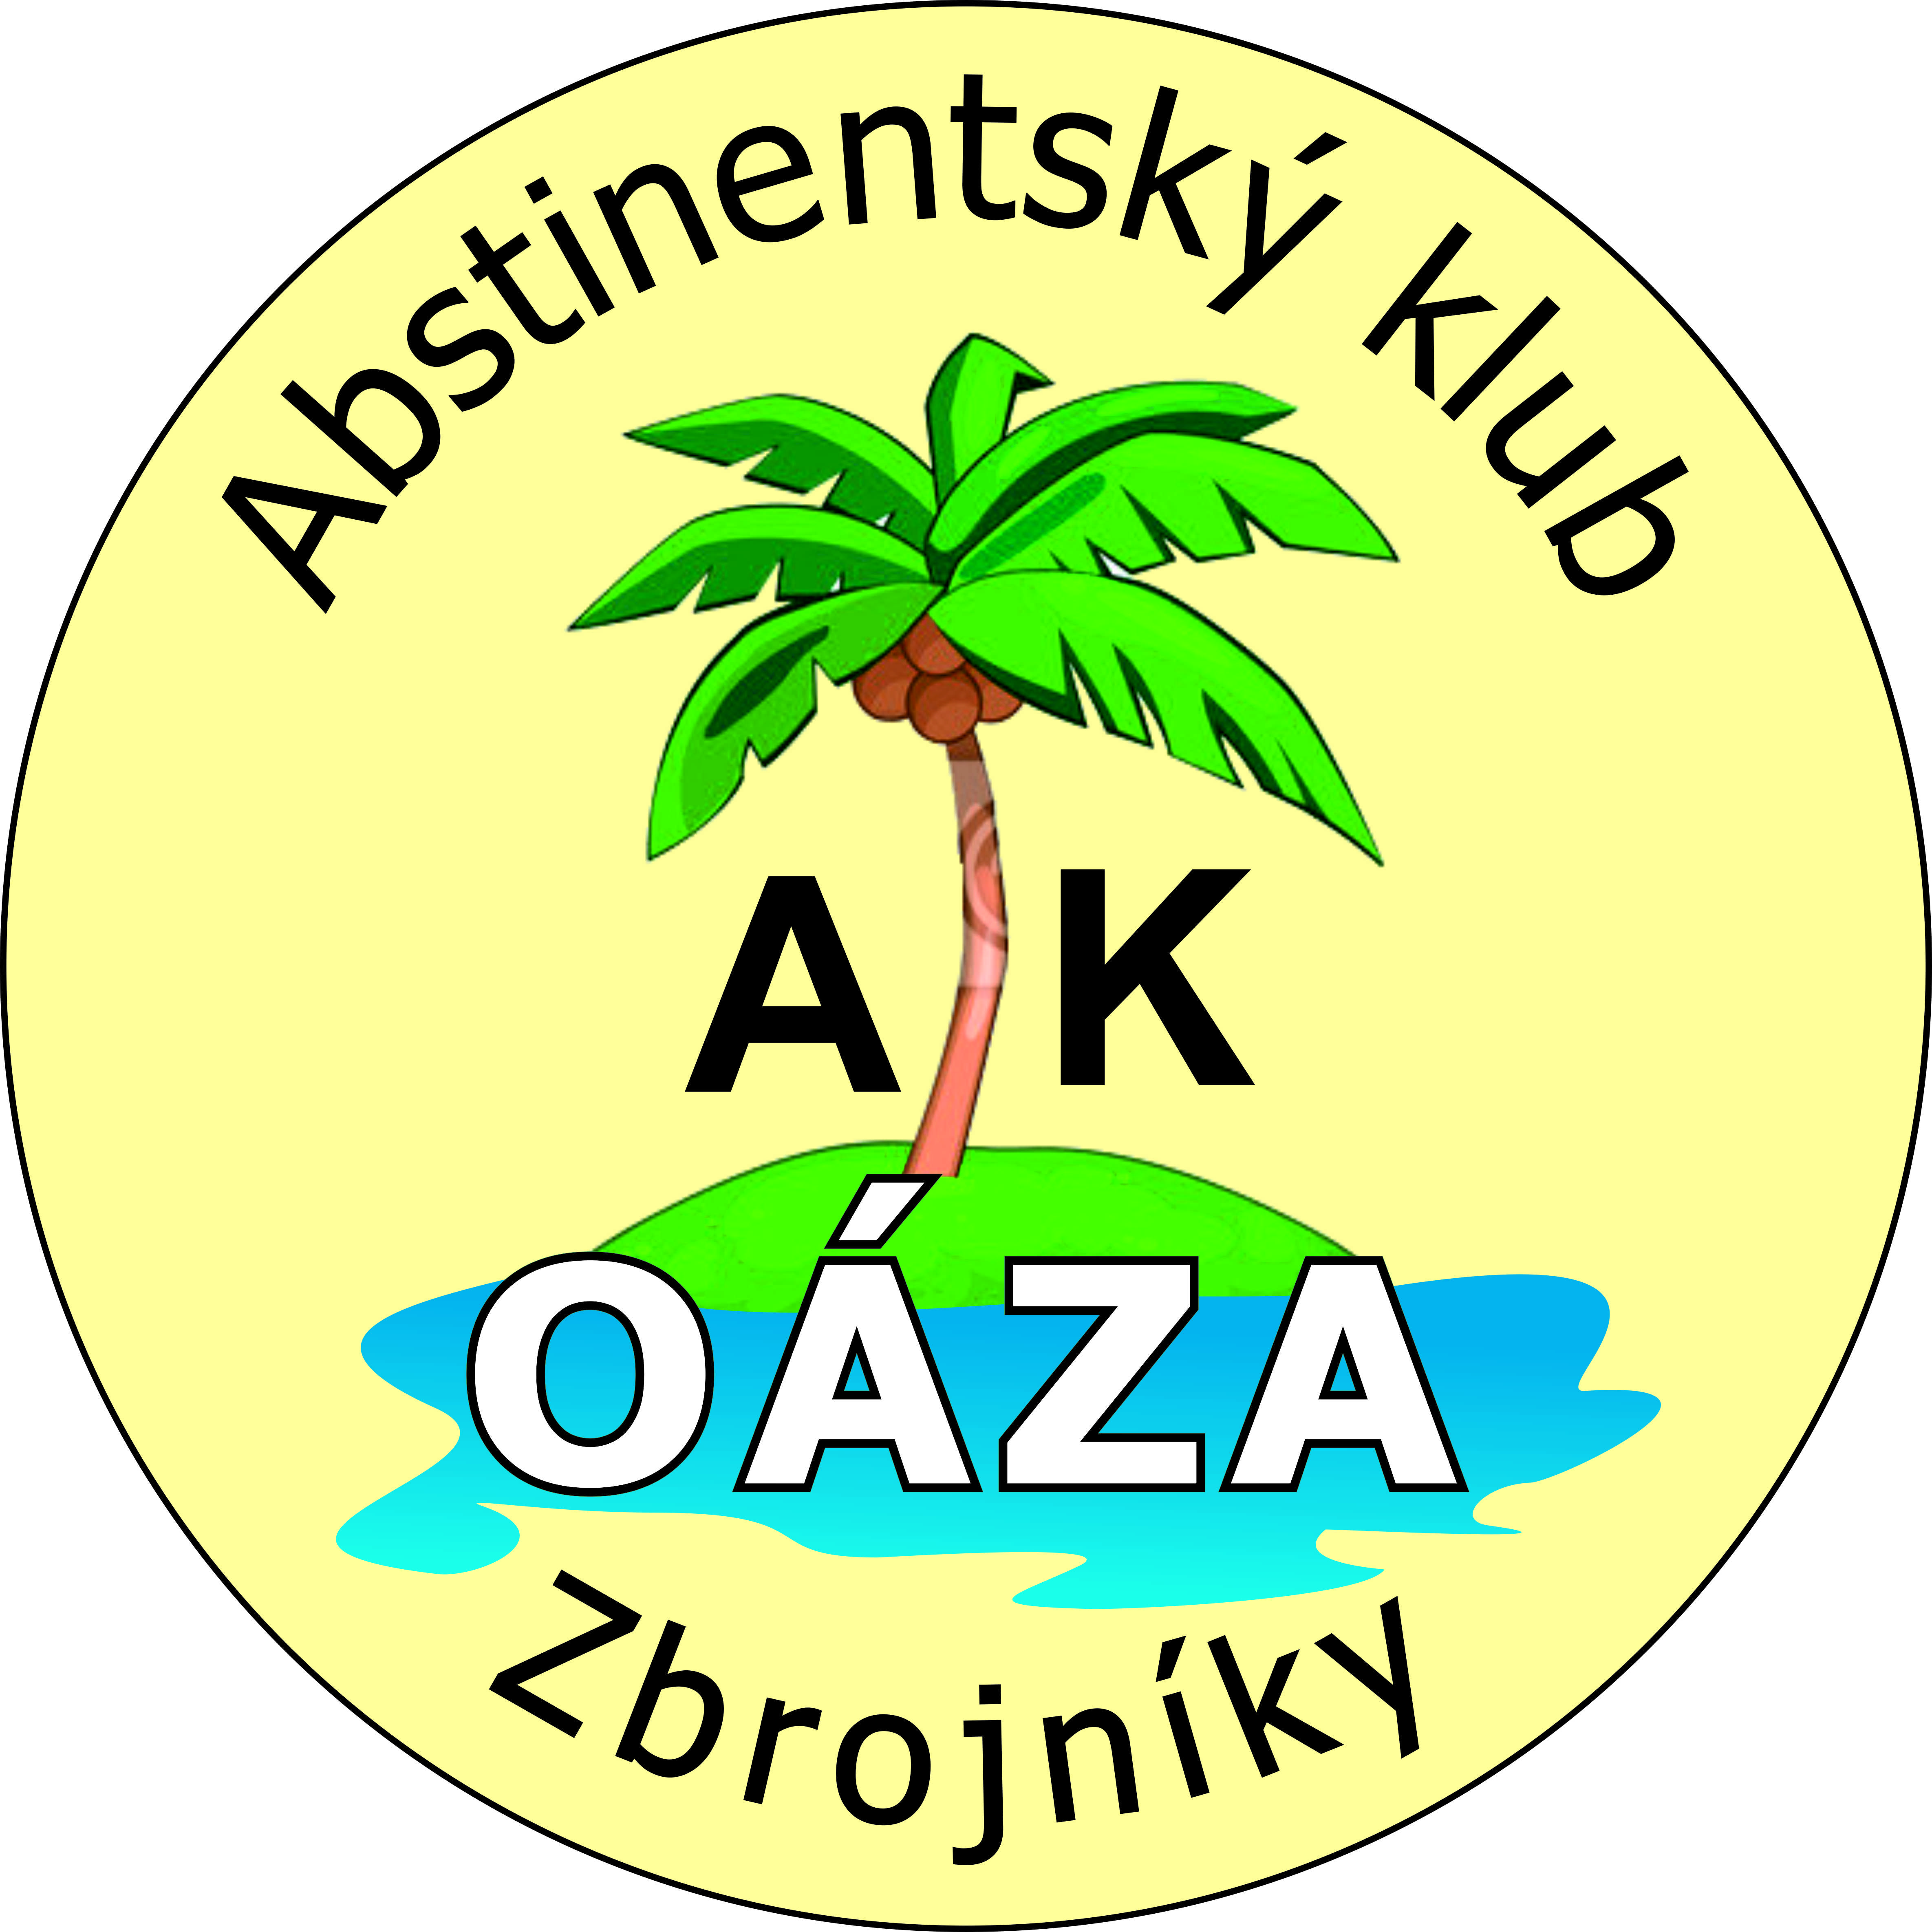 abstinensky_kulub_oaza.jpg - 1.58 MB